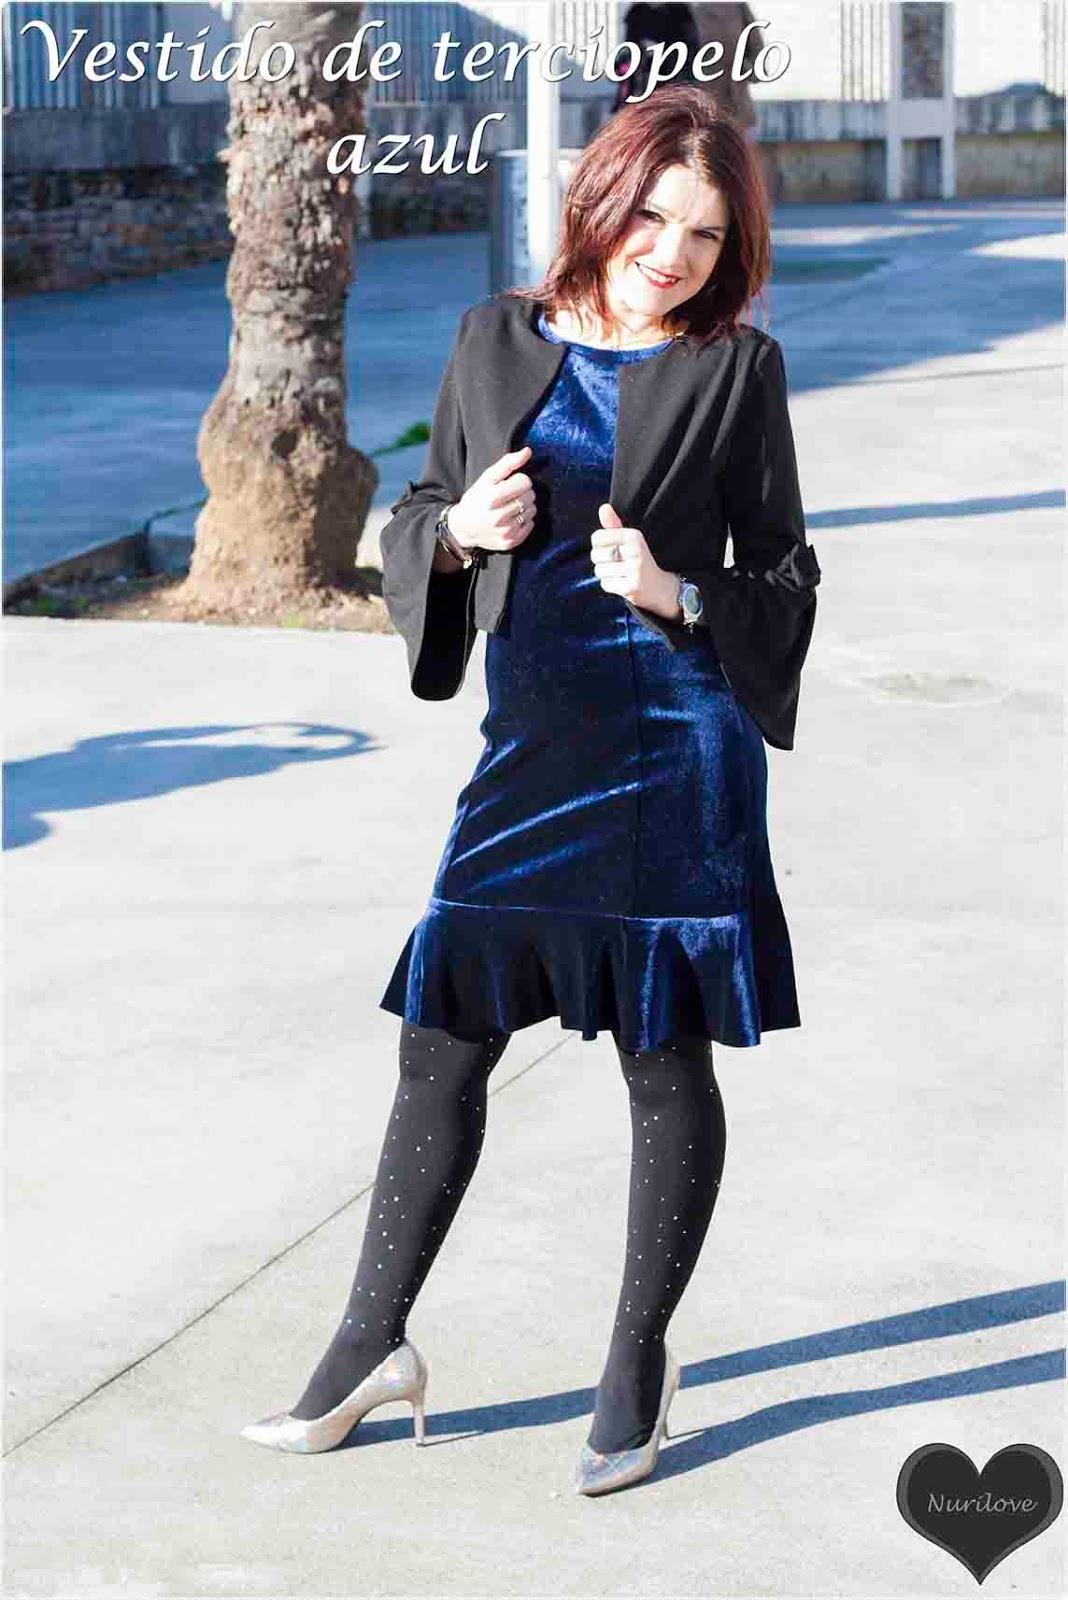 Vestido de terciopelo azul